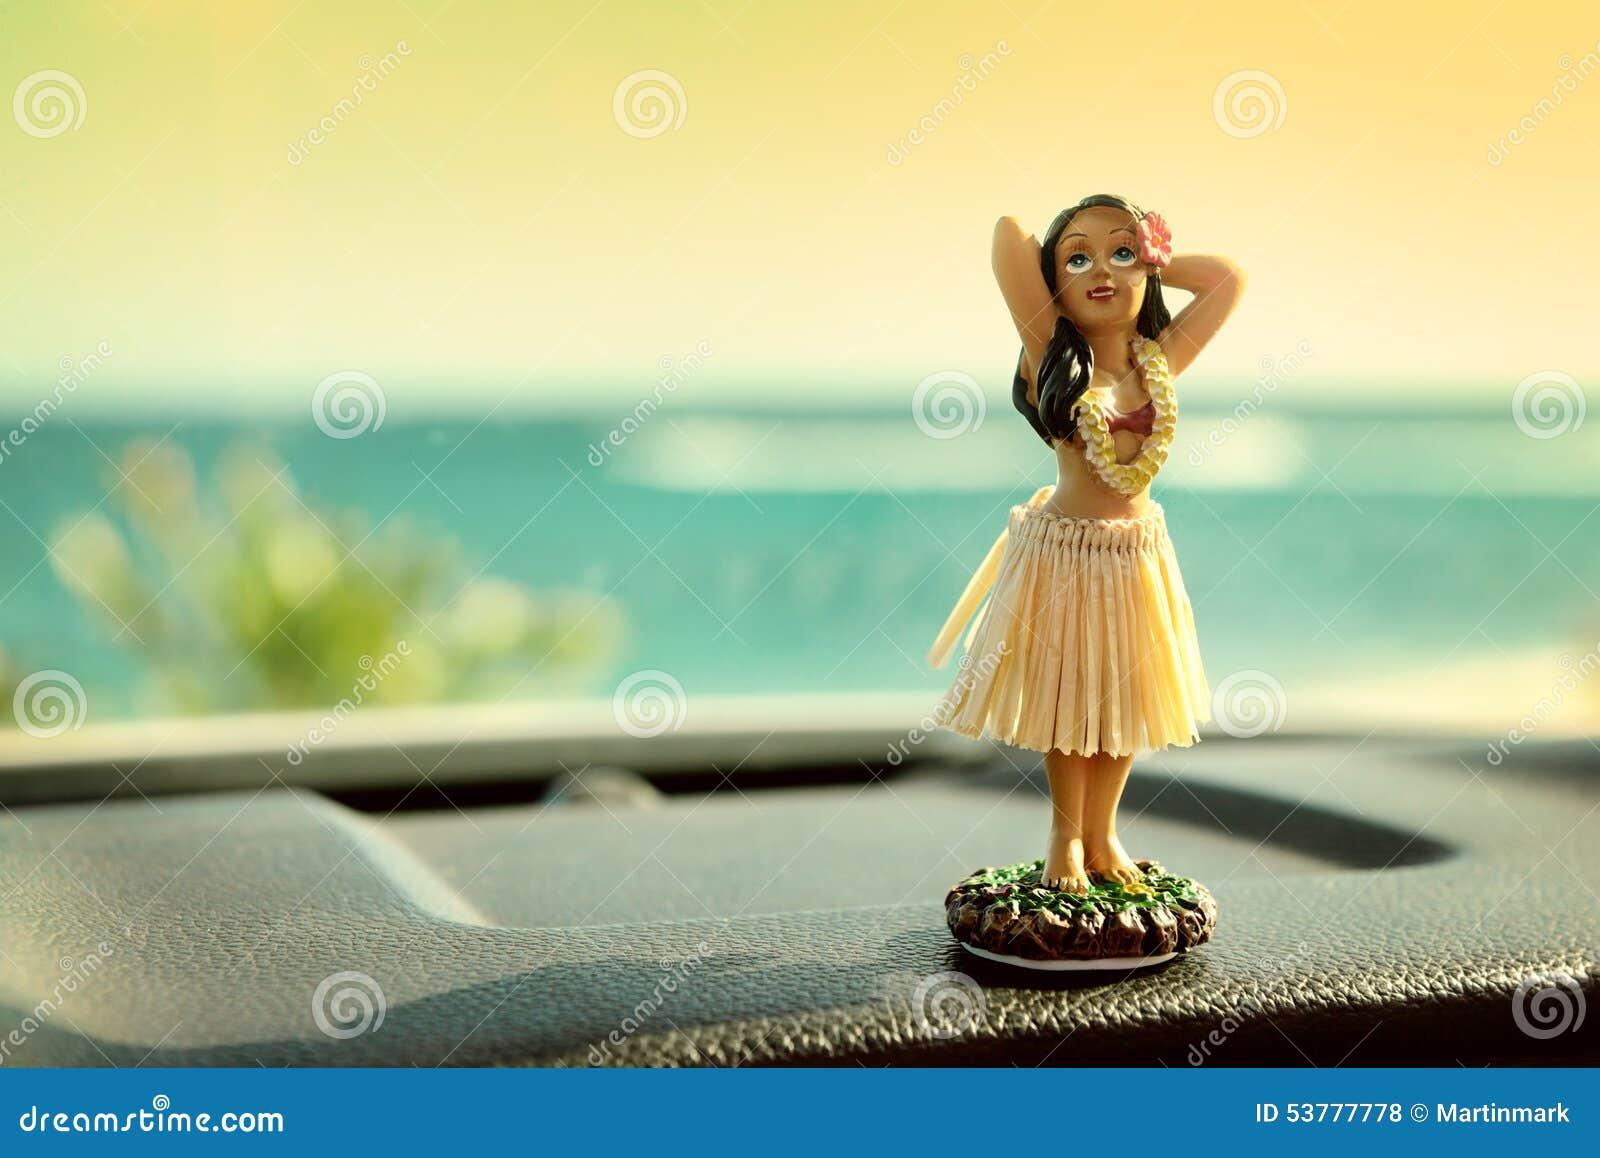 Hula dancer doll on Hawaii car road trip